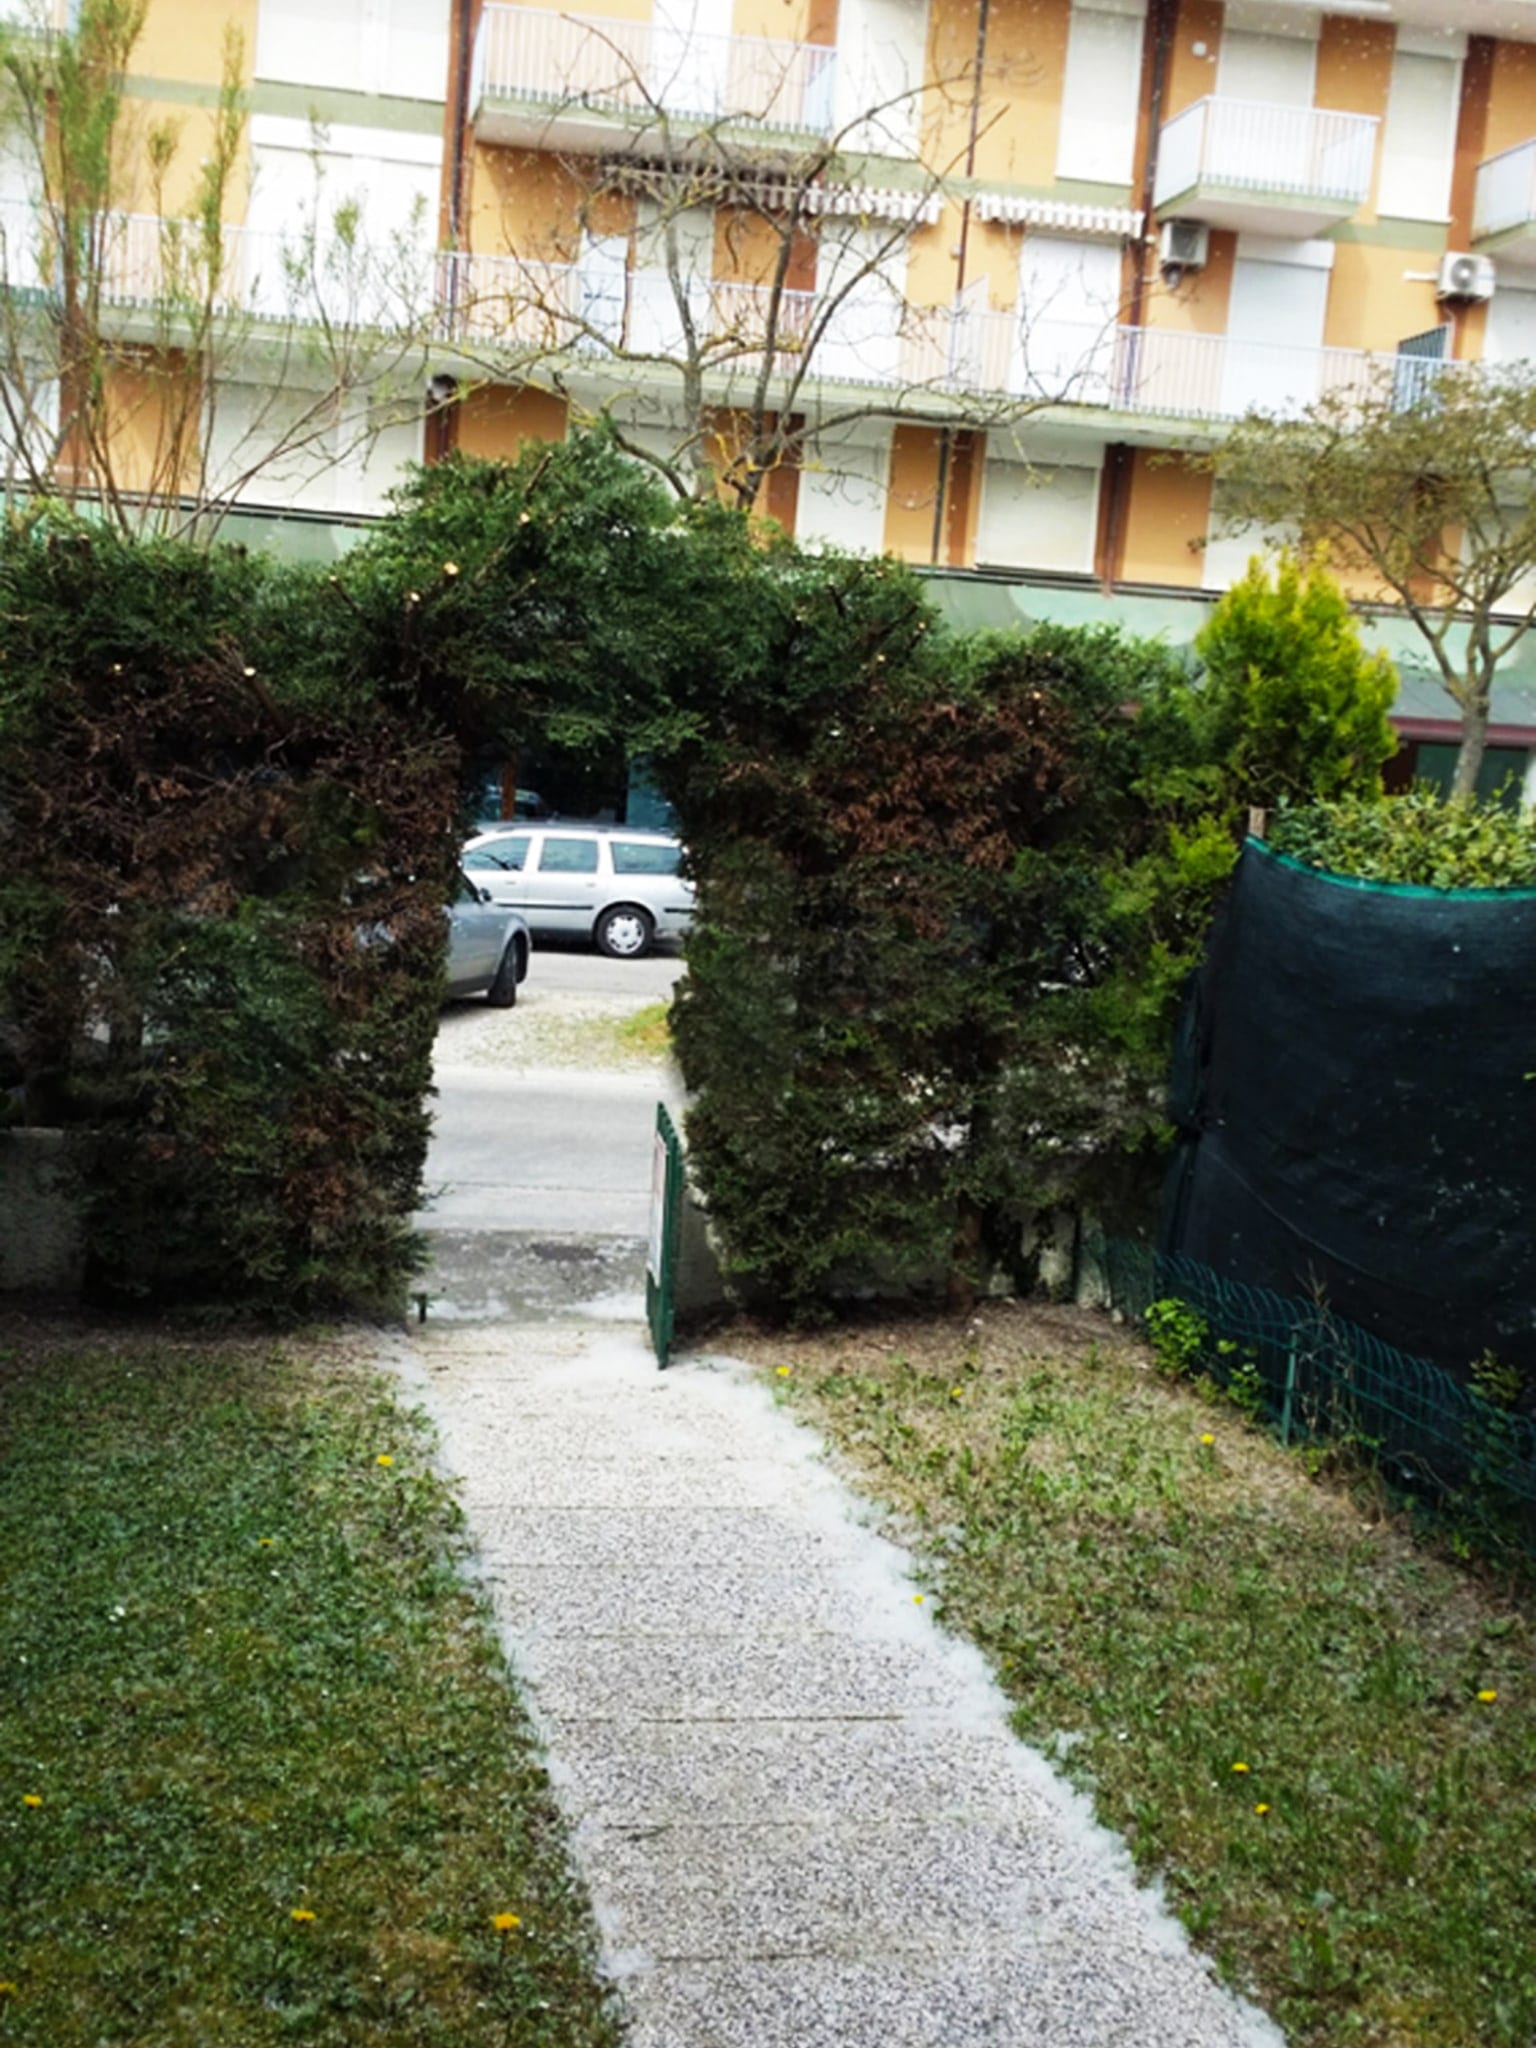 ingresso giardino villetta indipendente con giardino villa malaga porto santa margherita